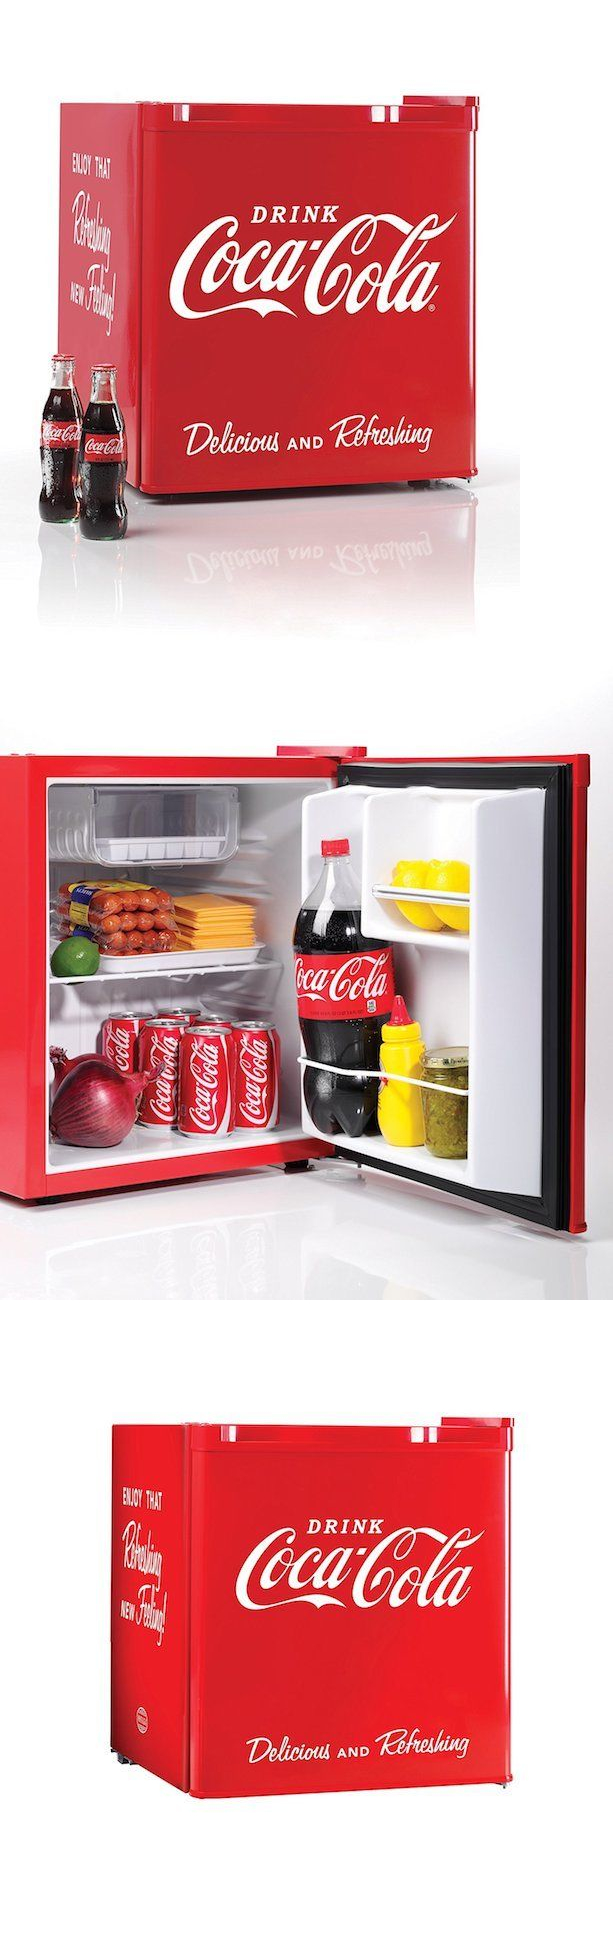 Mini Fridges 71262: College Dorm Room Accessories Coca Cola Mini Fridge  Small Refrigerator Freezer   Part 71